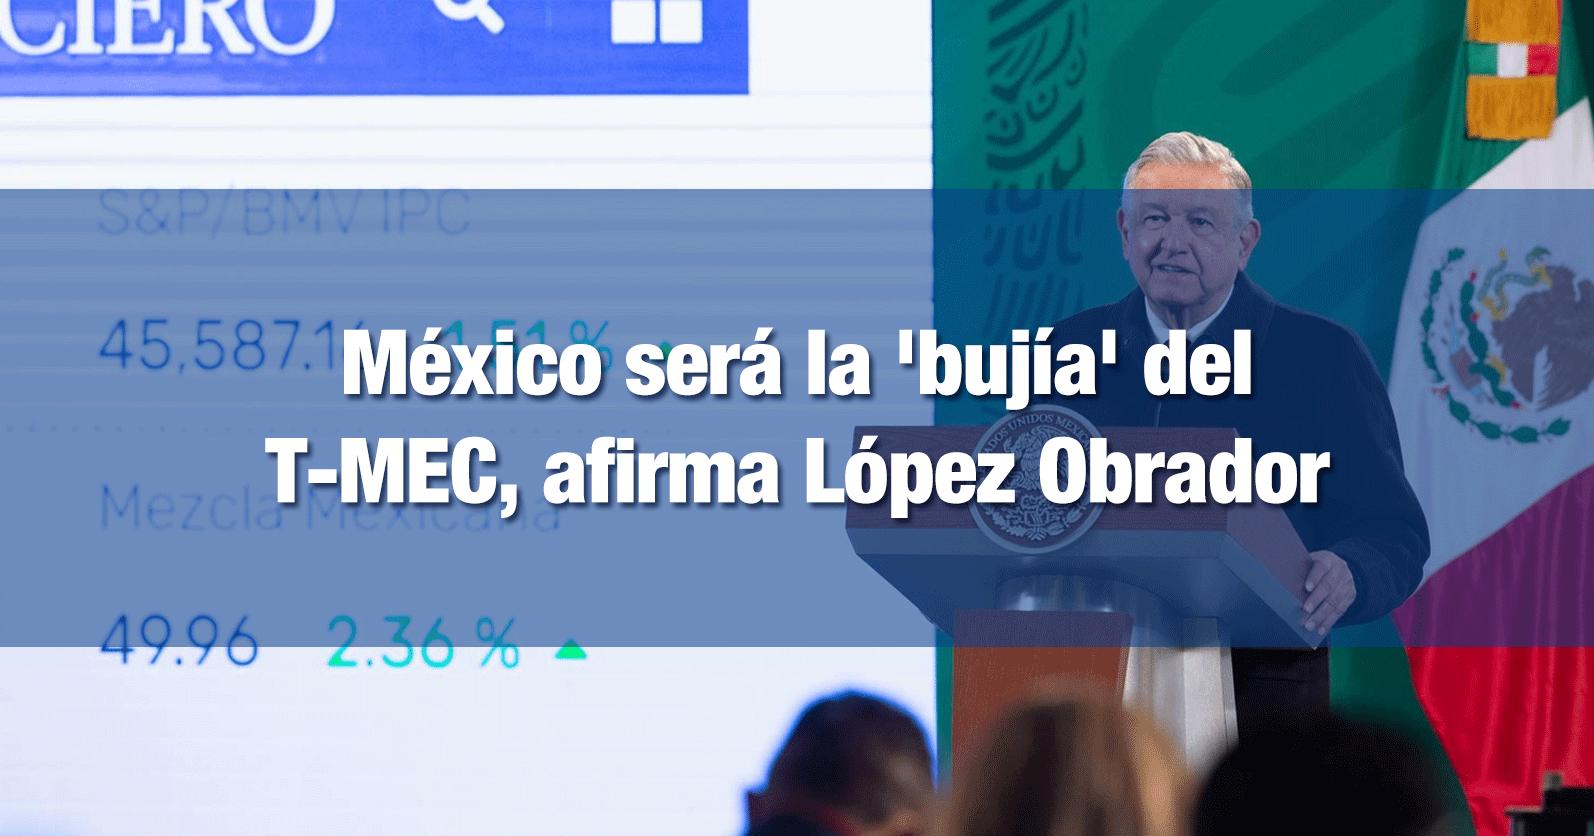 México será la 'bujía' del T-MEC, afirma López Obrador